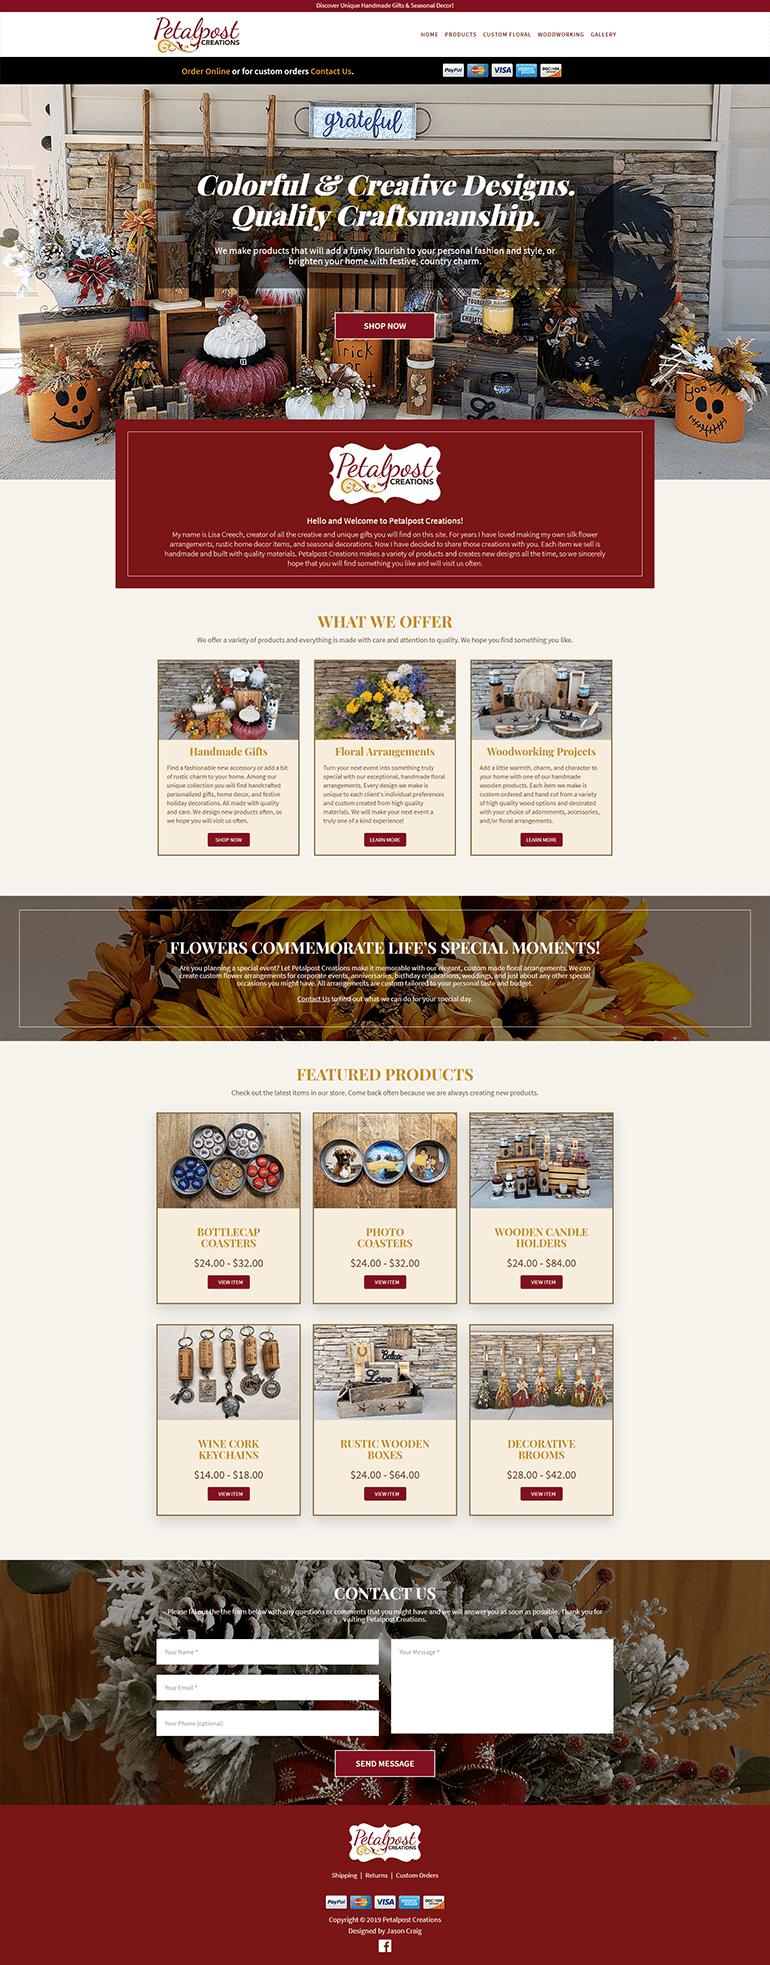 Petalpost Creations website homepage layout.